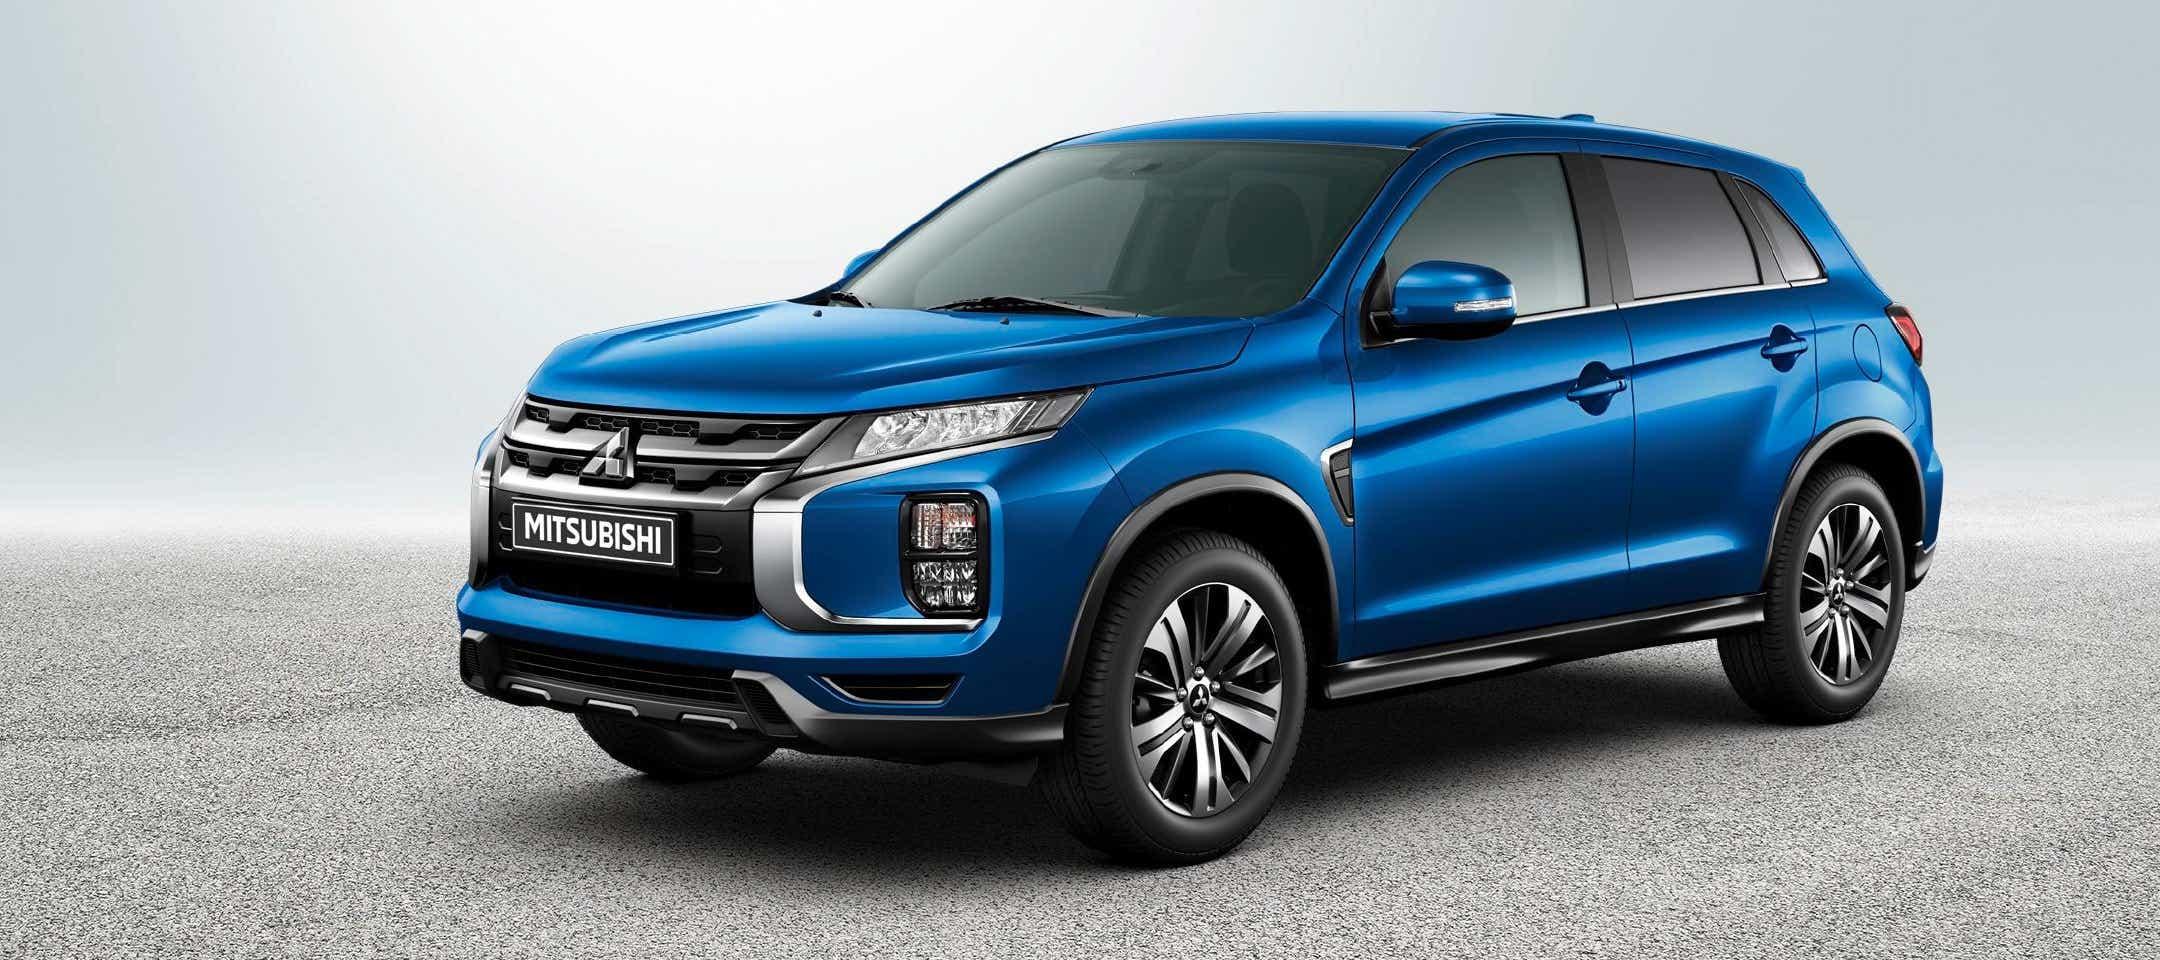 Mitsubishi Asx Redesign and Concept